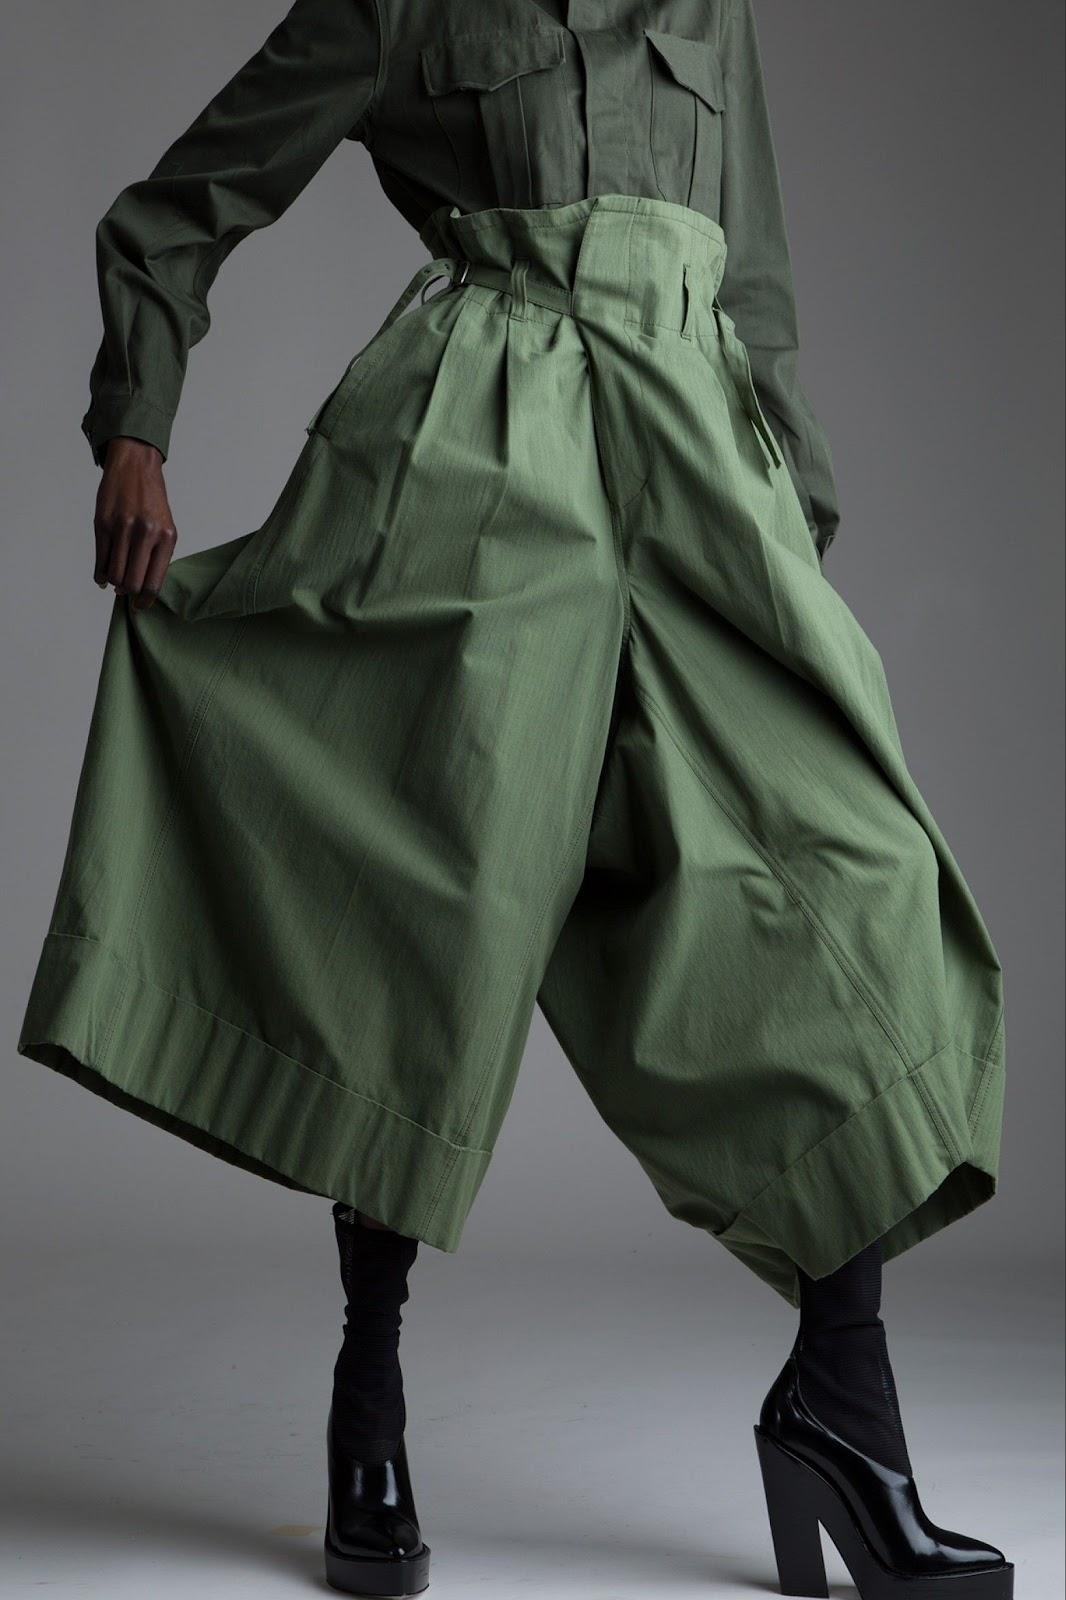 Vintage Junya Watanabe Comme des Garçons Trousers | Fashion, Vintage  designer clothing, Vintage trousers